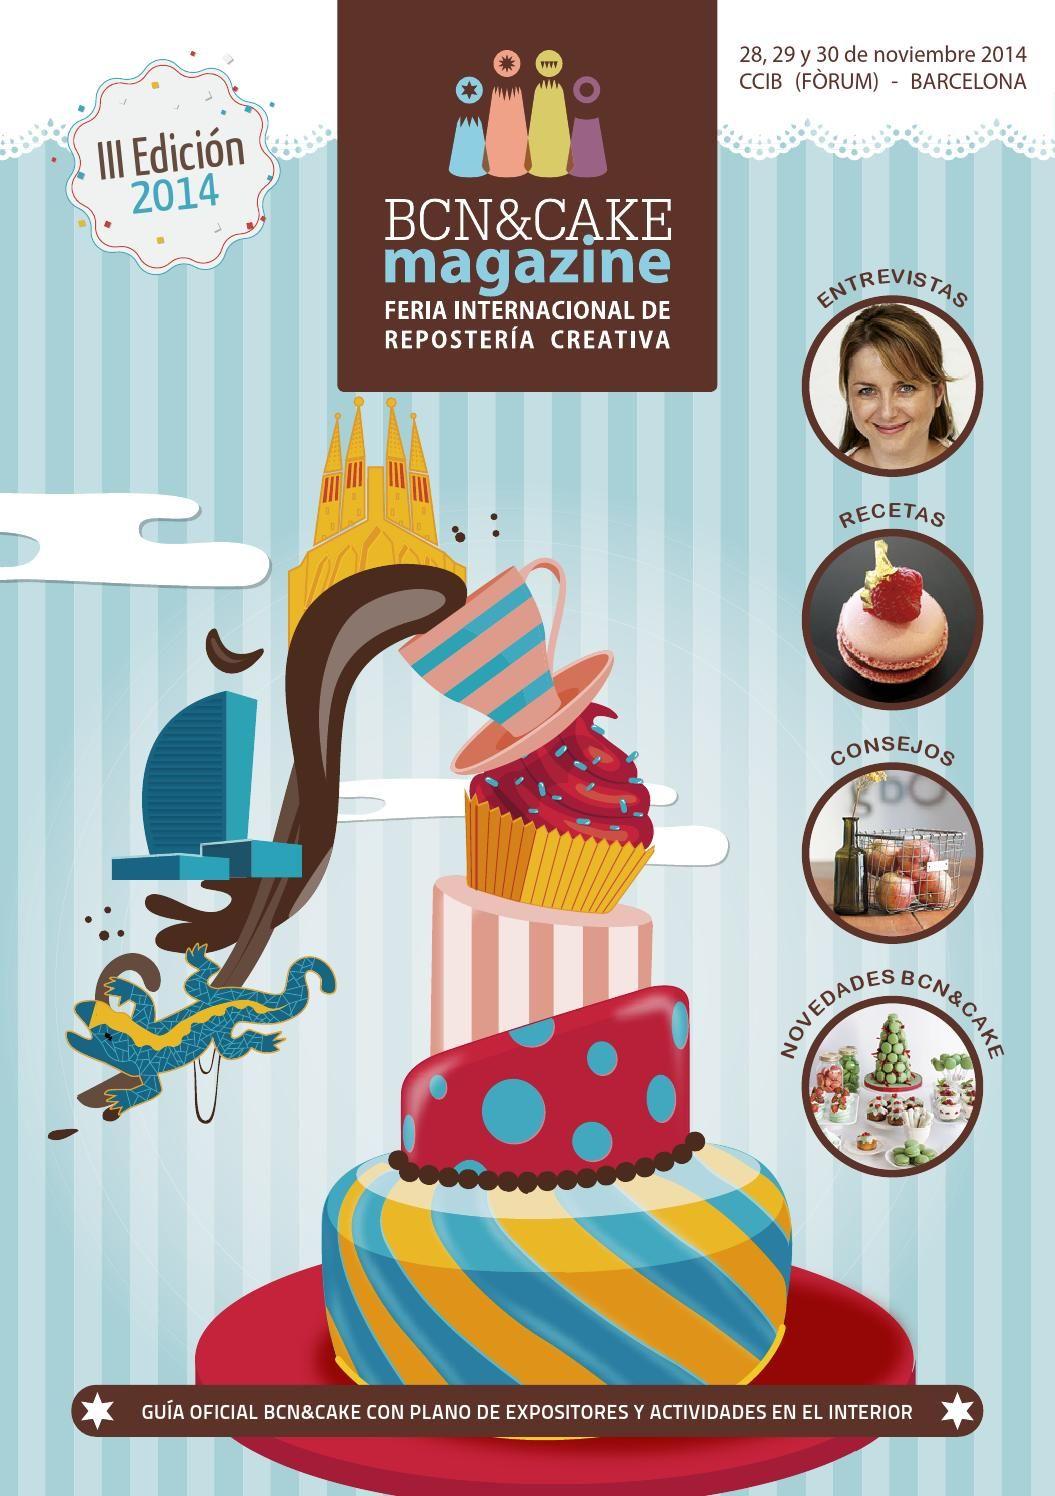 BCN&CAKE digital2014 Revista Oficial del BCN&CAKE, Feria Internacional de Repostería Creativa de Barcelona